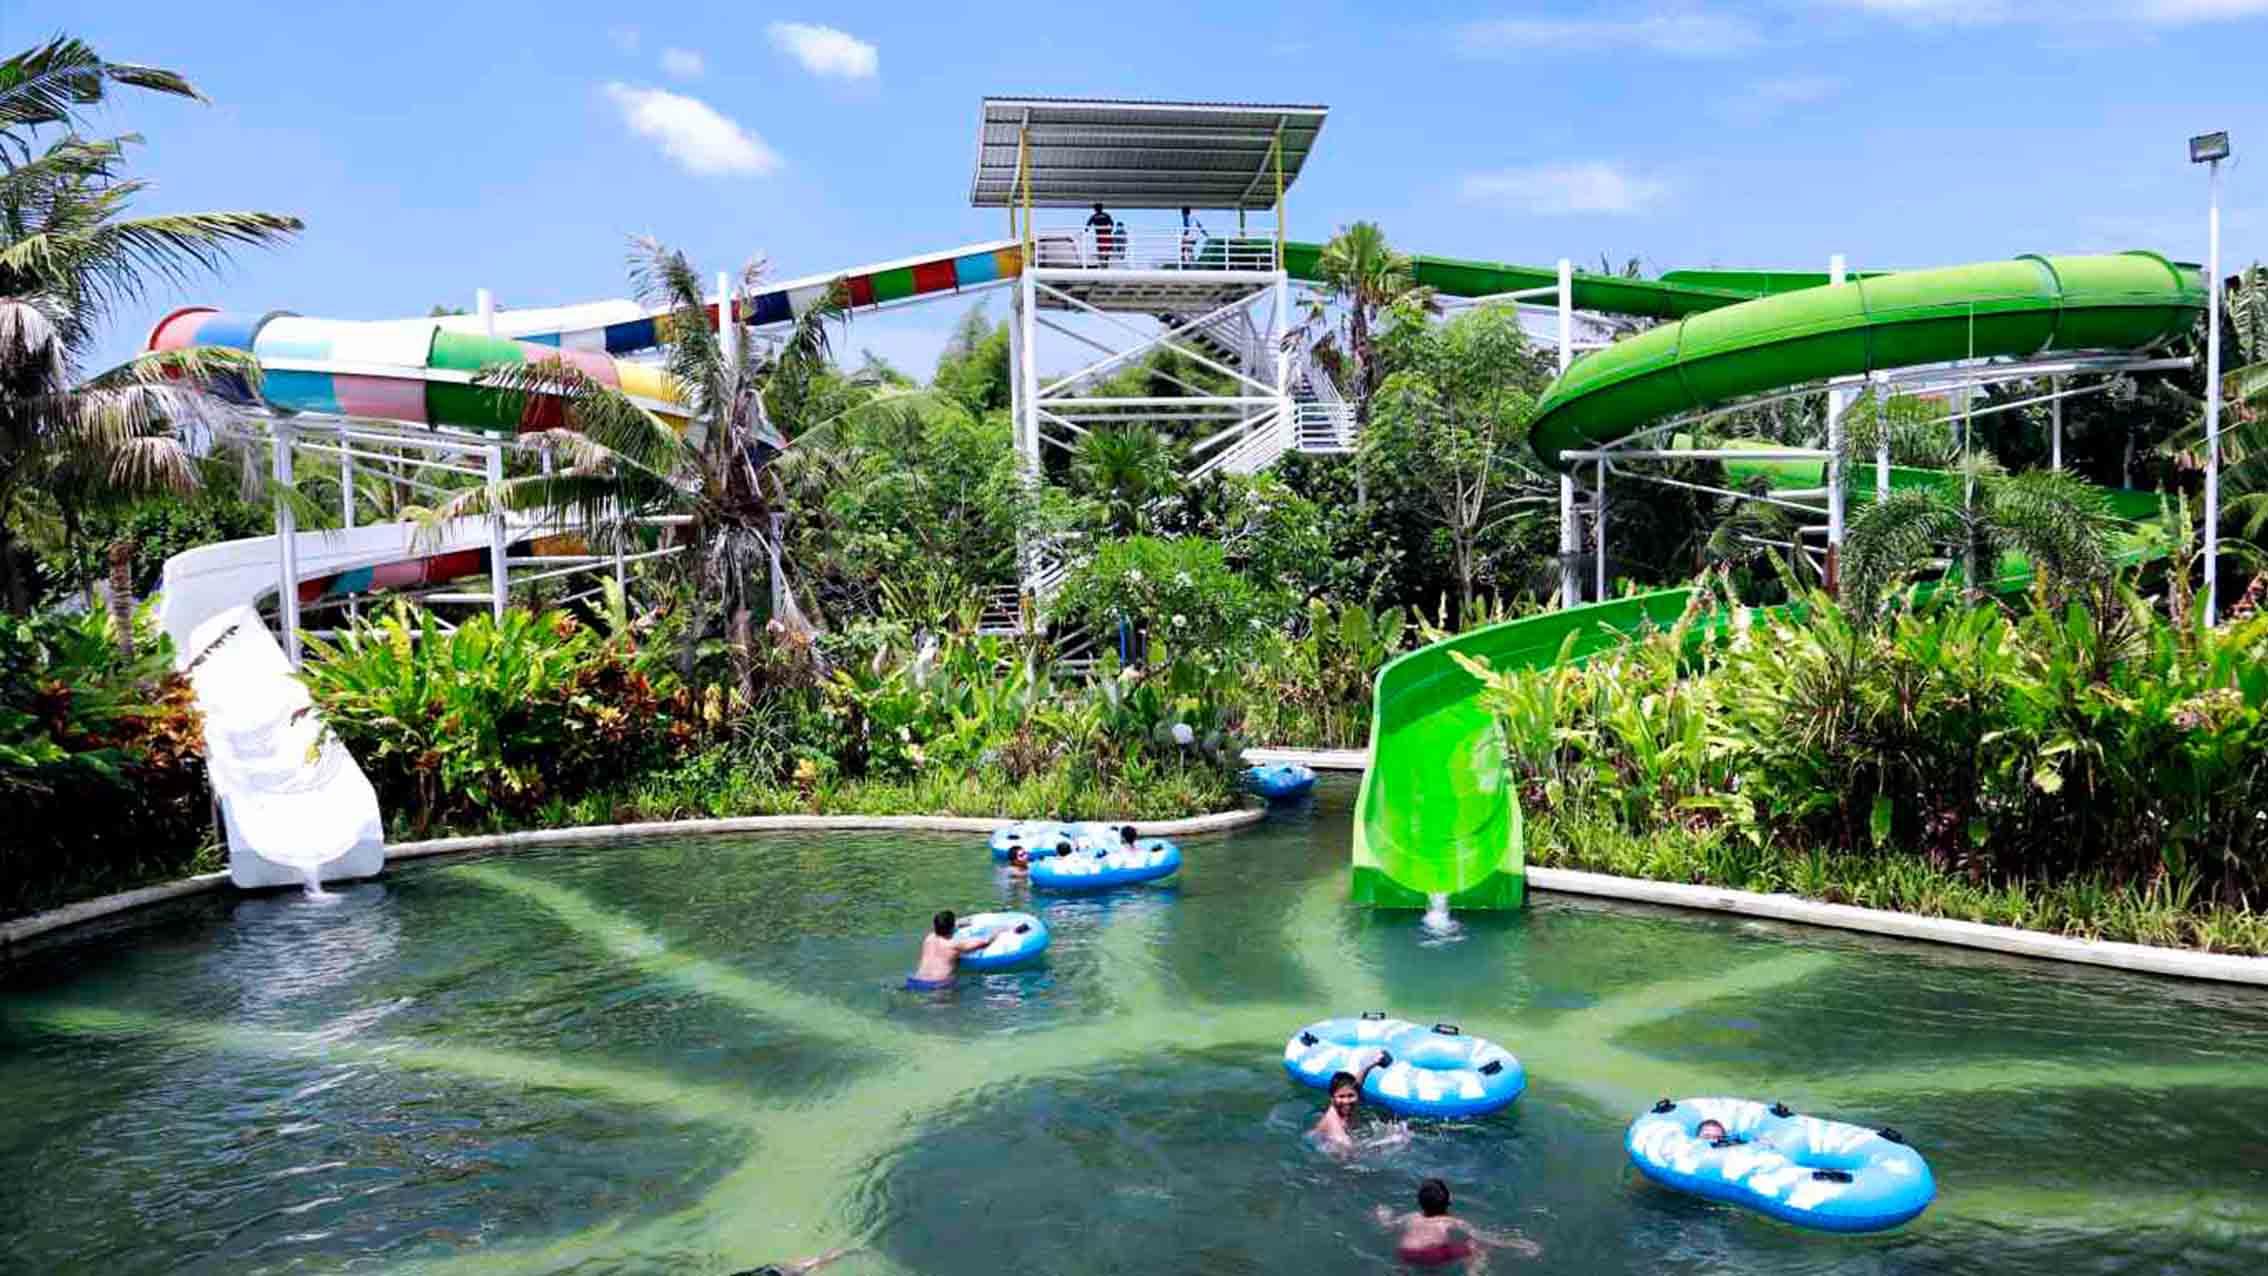 Circus Waterpark Activities Bali Fun Place Water Park Kab Badung